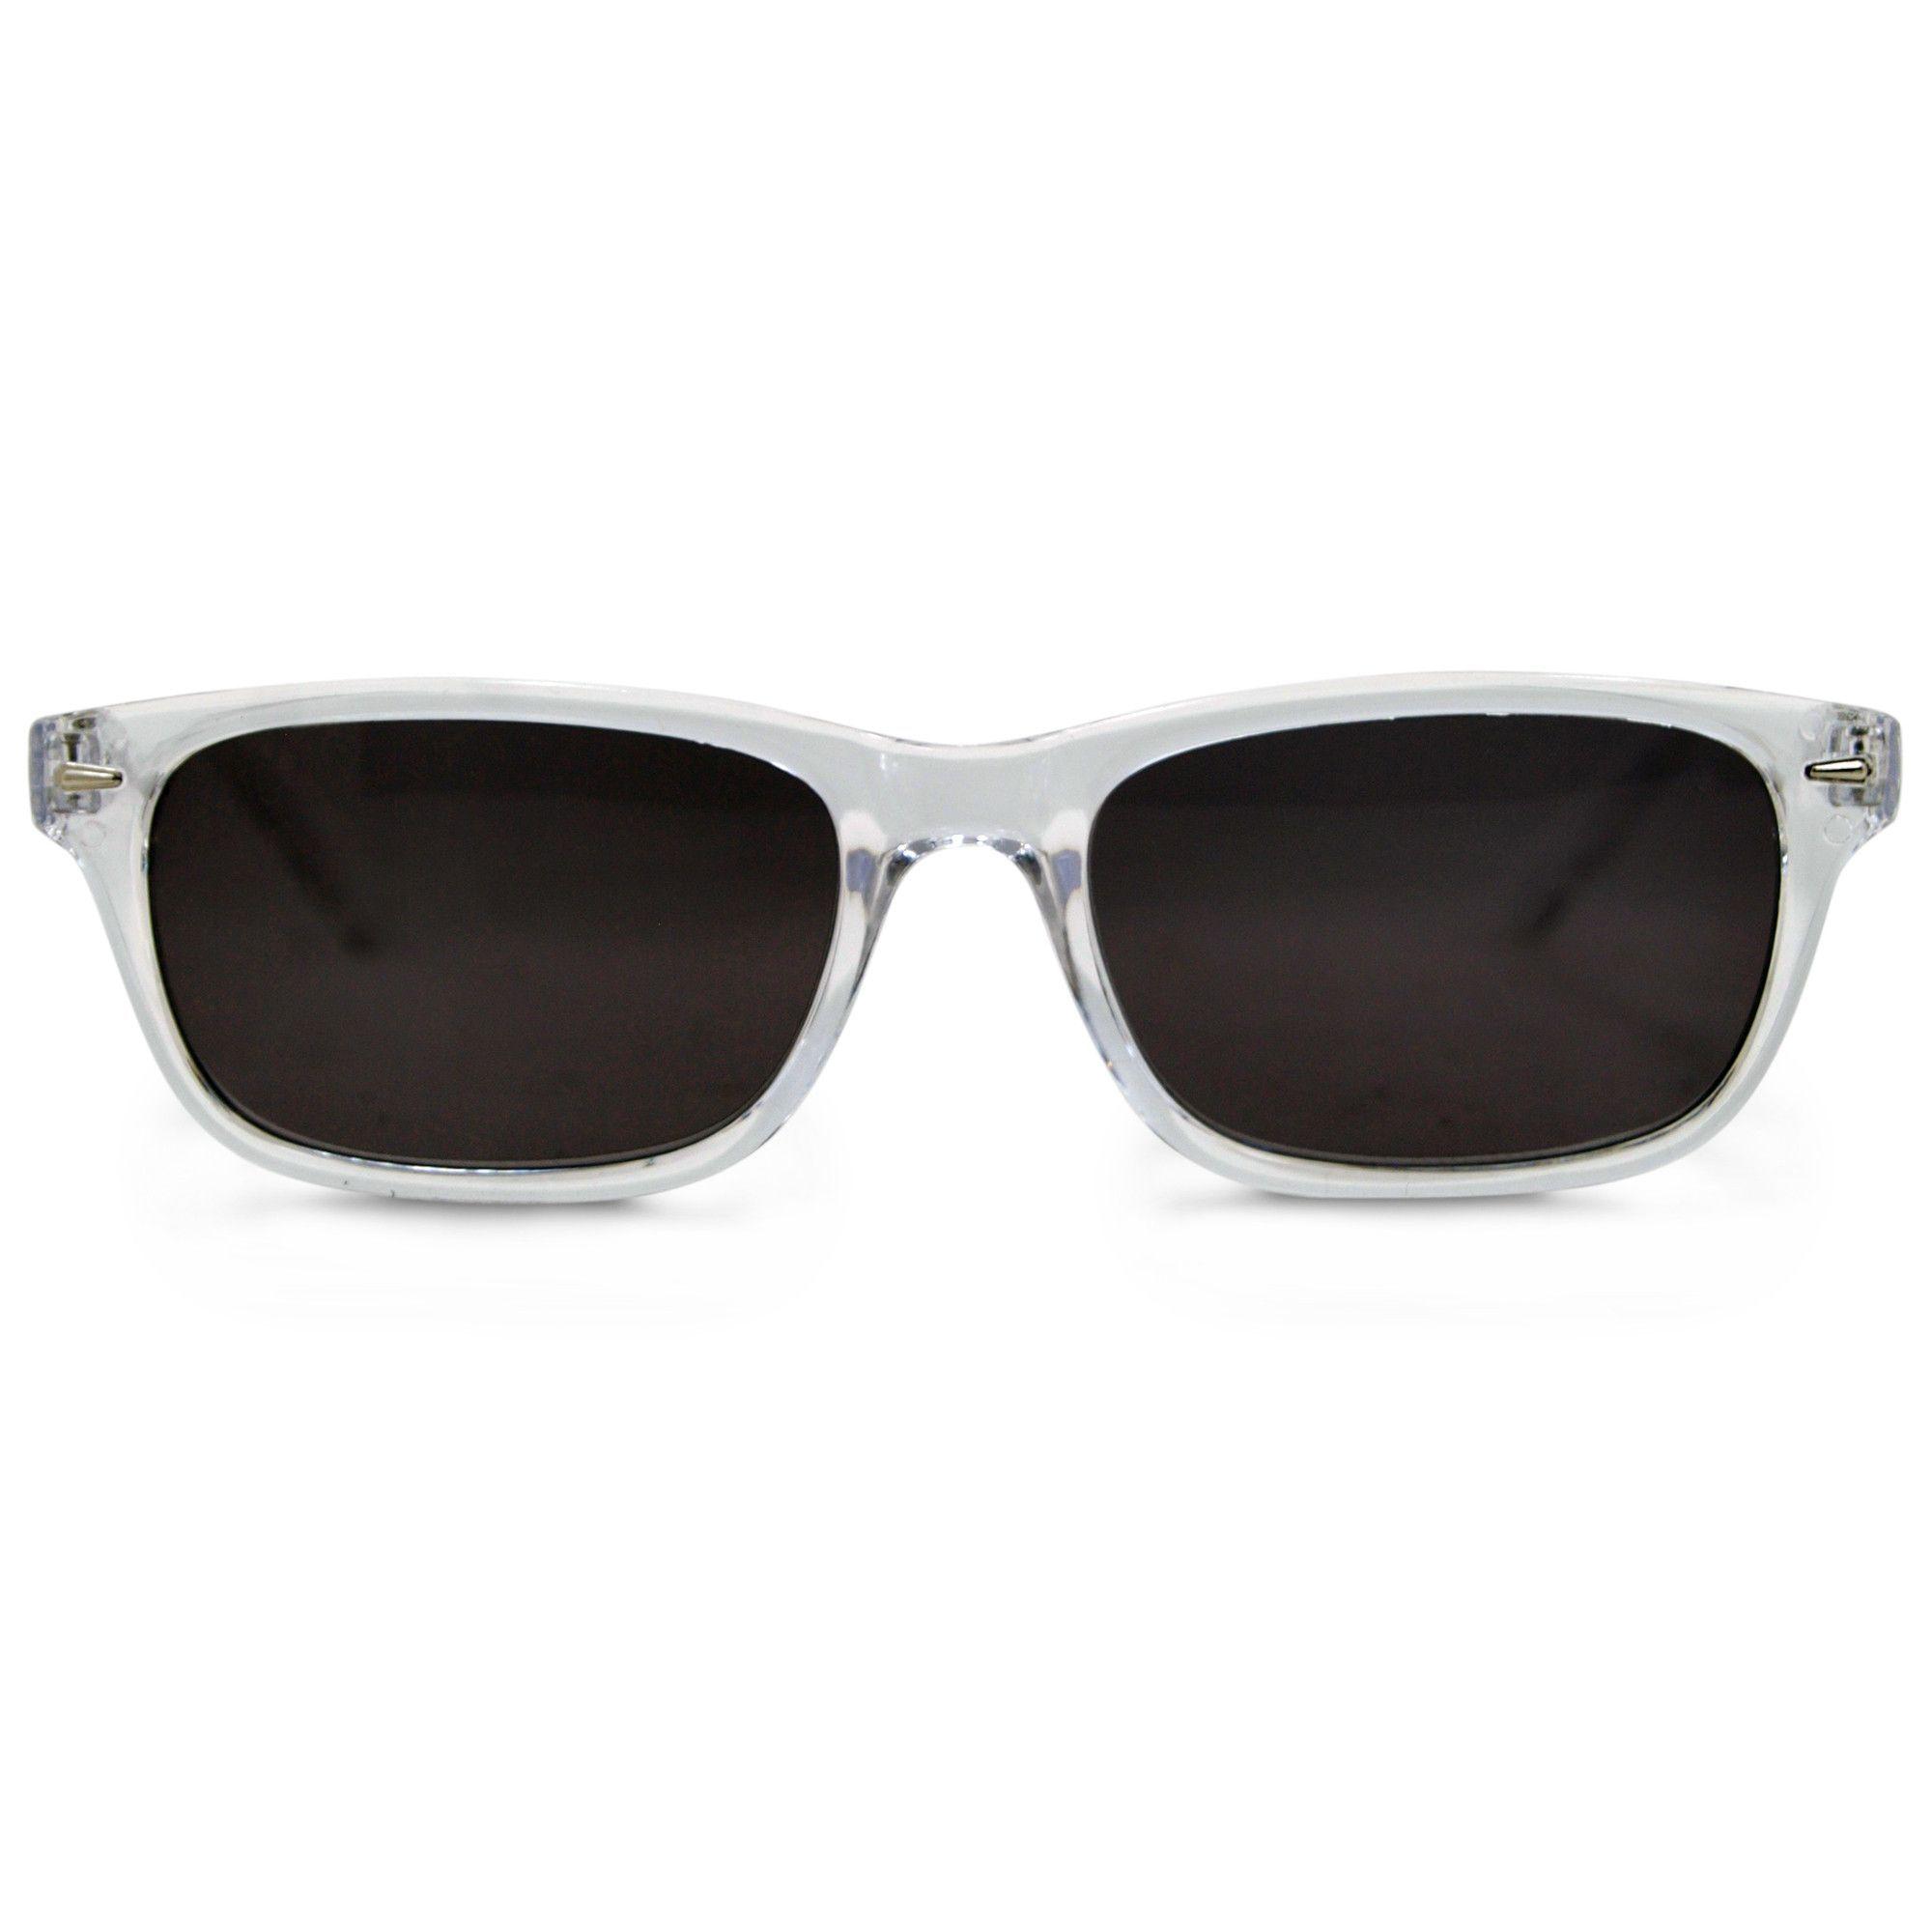 Seymore Wayfarer Full Reader Sunglasses, NOT Bifocals